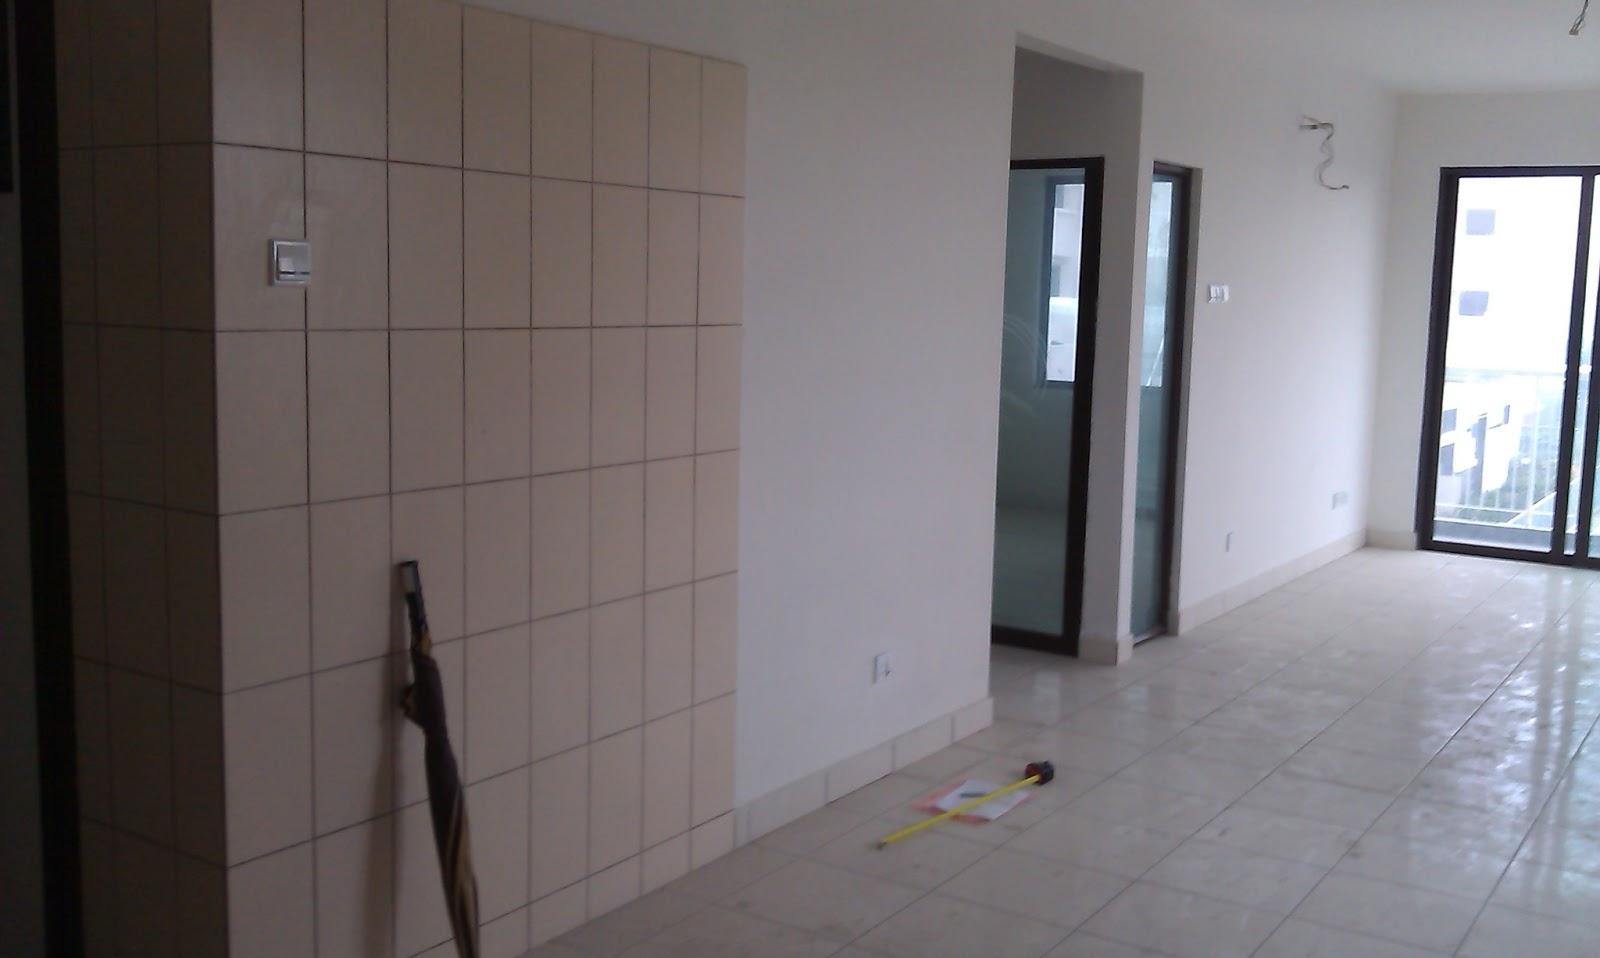 Subang Andaman Condominium Subang Andaman Unit 2a Corner Internal Finishing Pictures Leaked